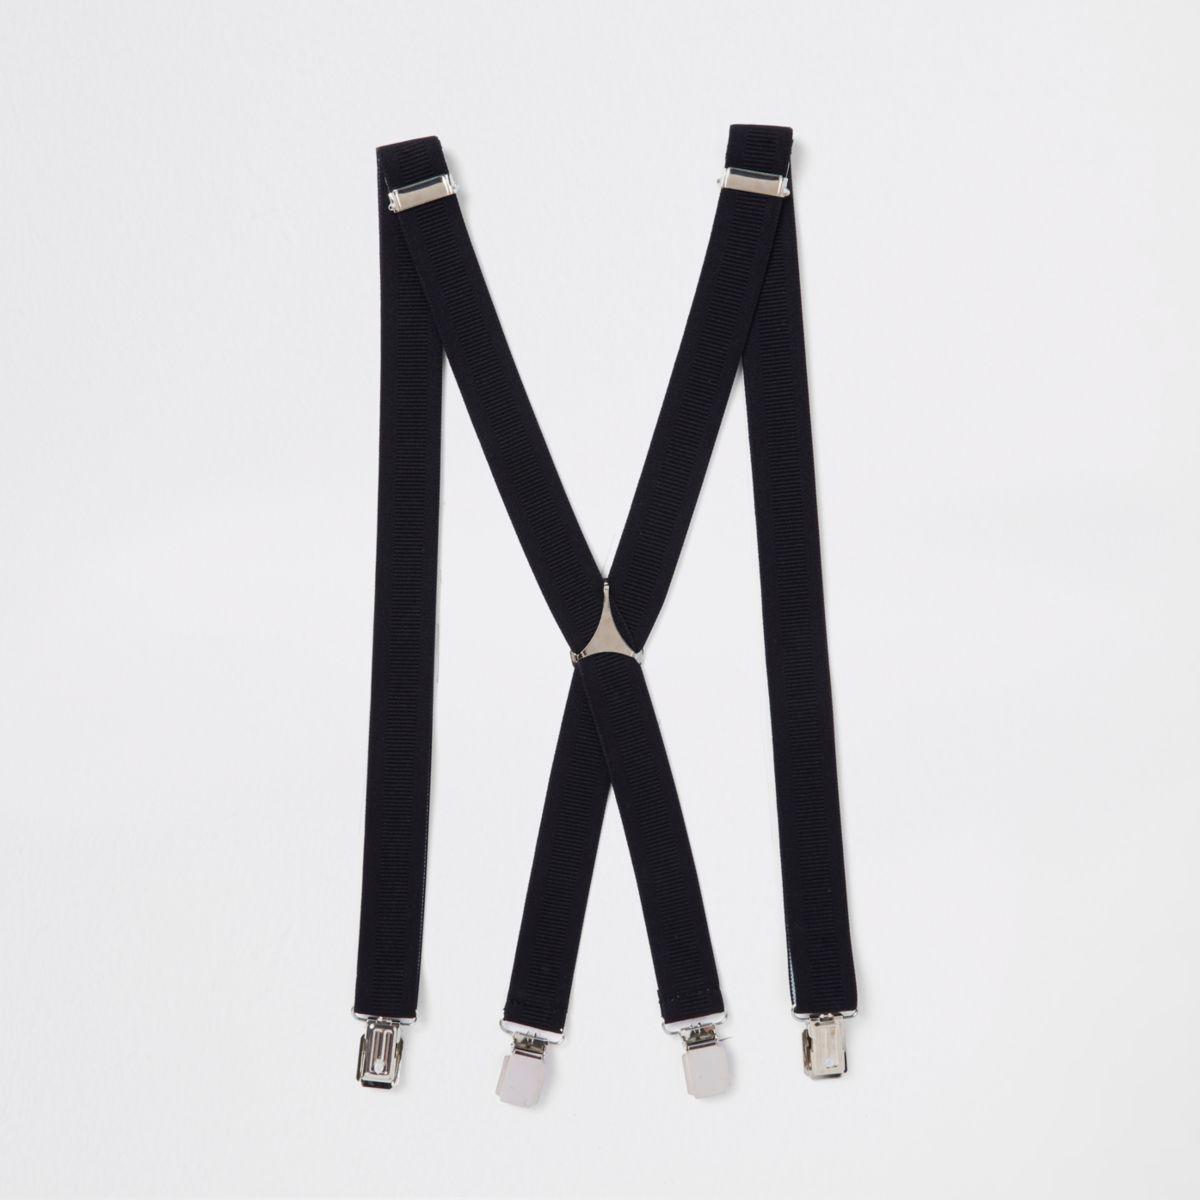 Black belt braces